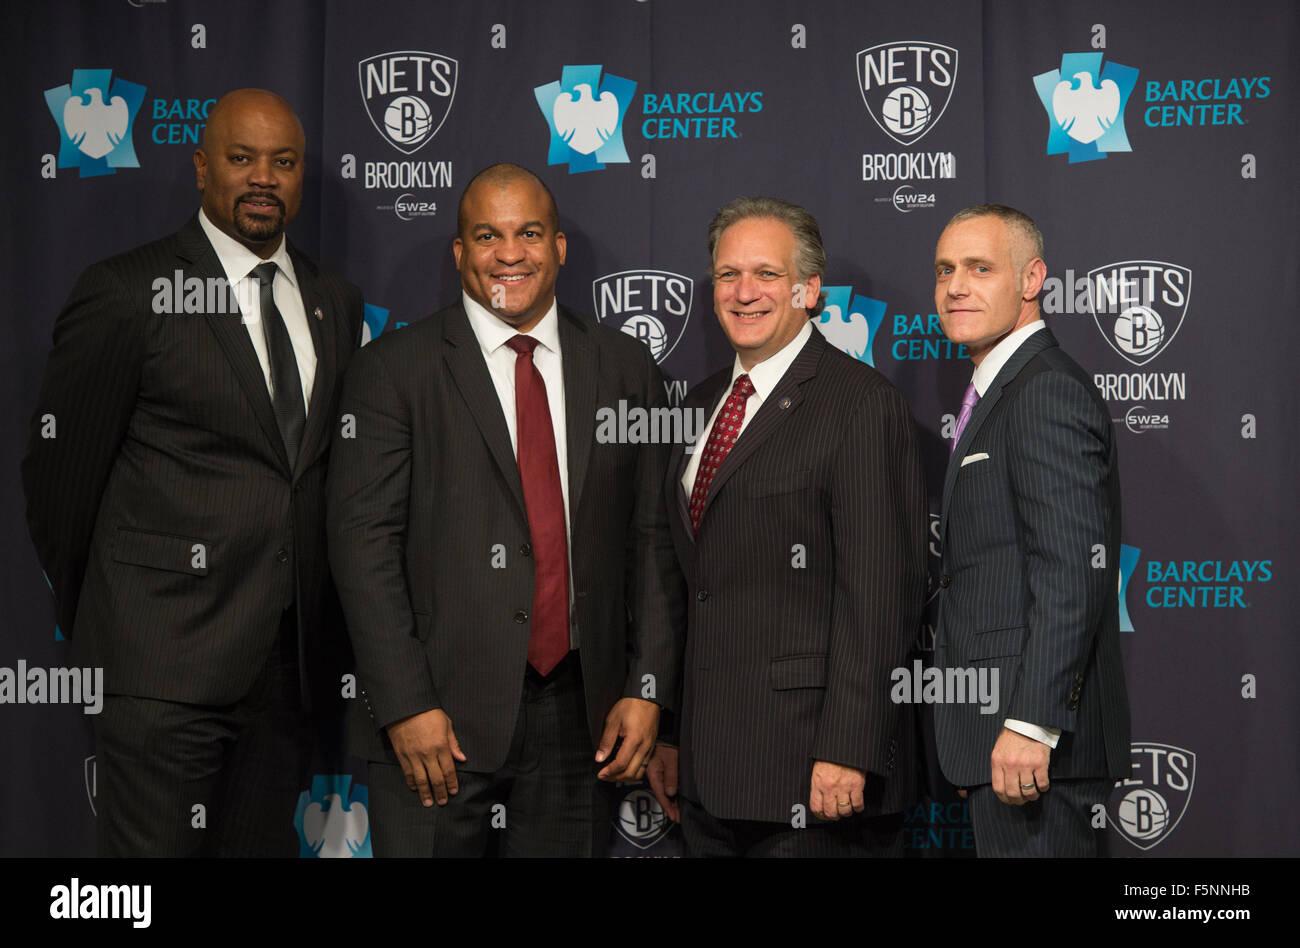 New York, NY, USA. 6th Nov, 2015. Nets GM BILLY KING, D-League President, MALCOLM TURNER, Nassau County executive - Stock Image